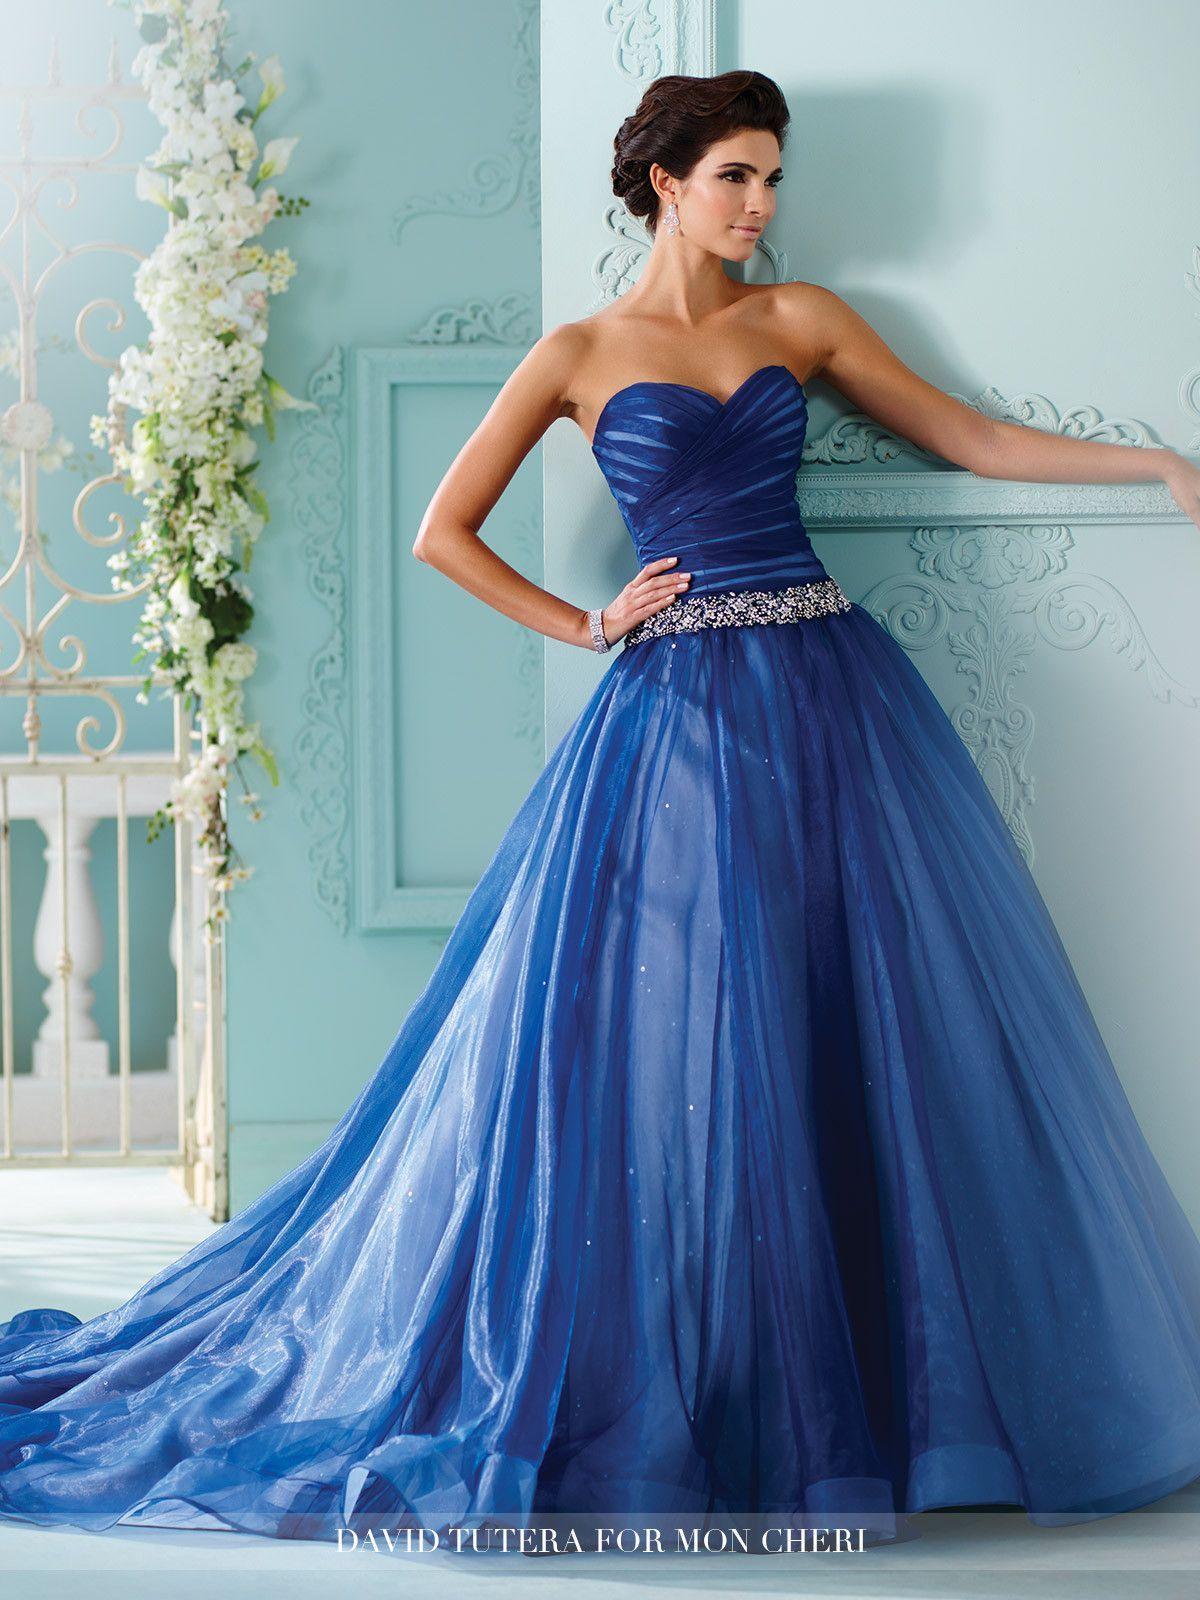 David Tutera - Indigo - 216257 - All Dressed Up, Bridal Gown | David ...